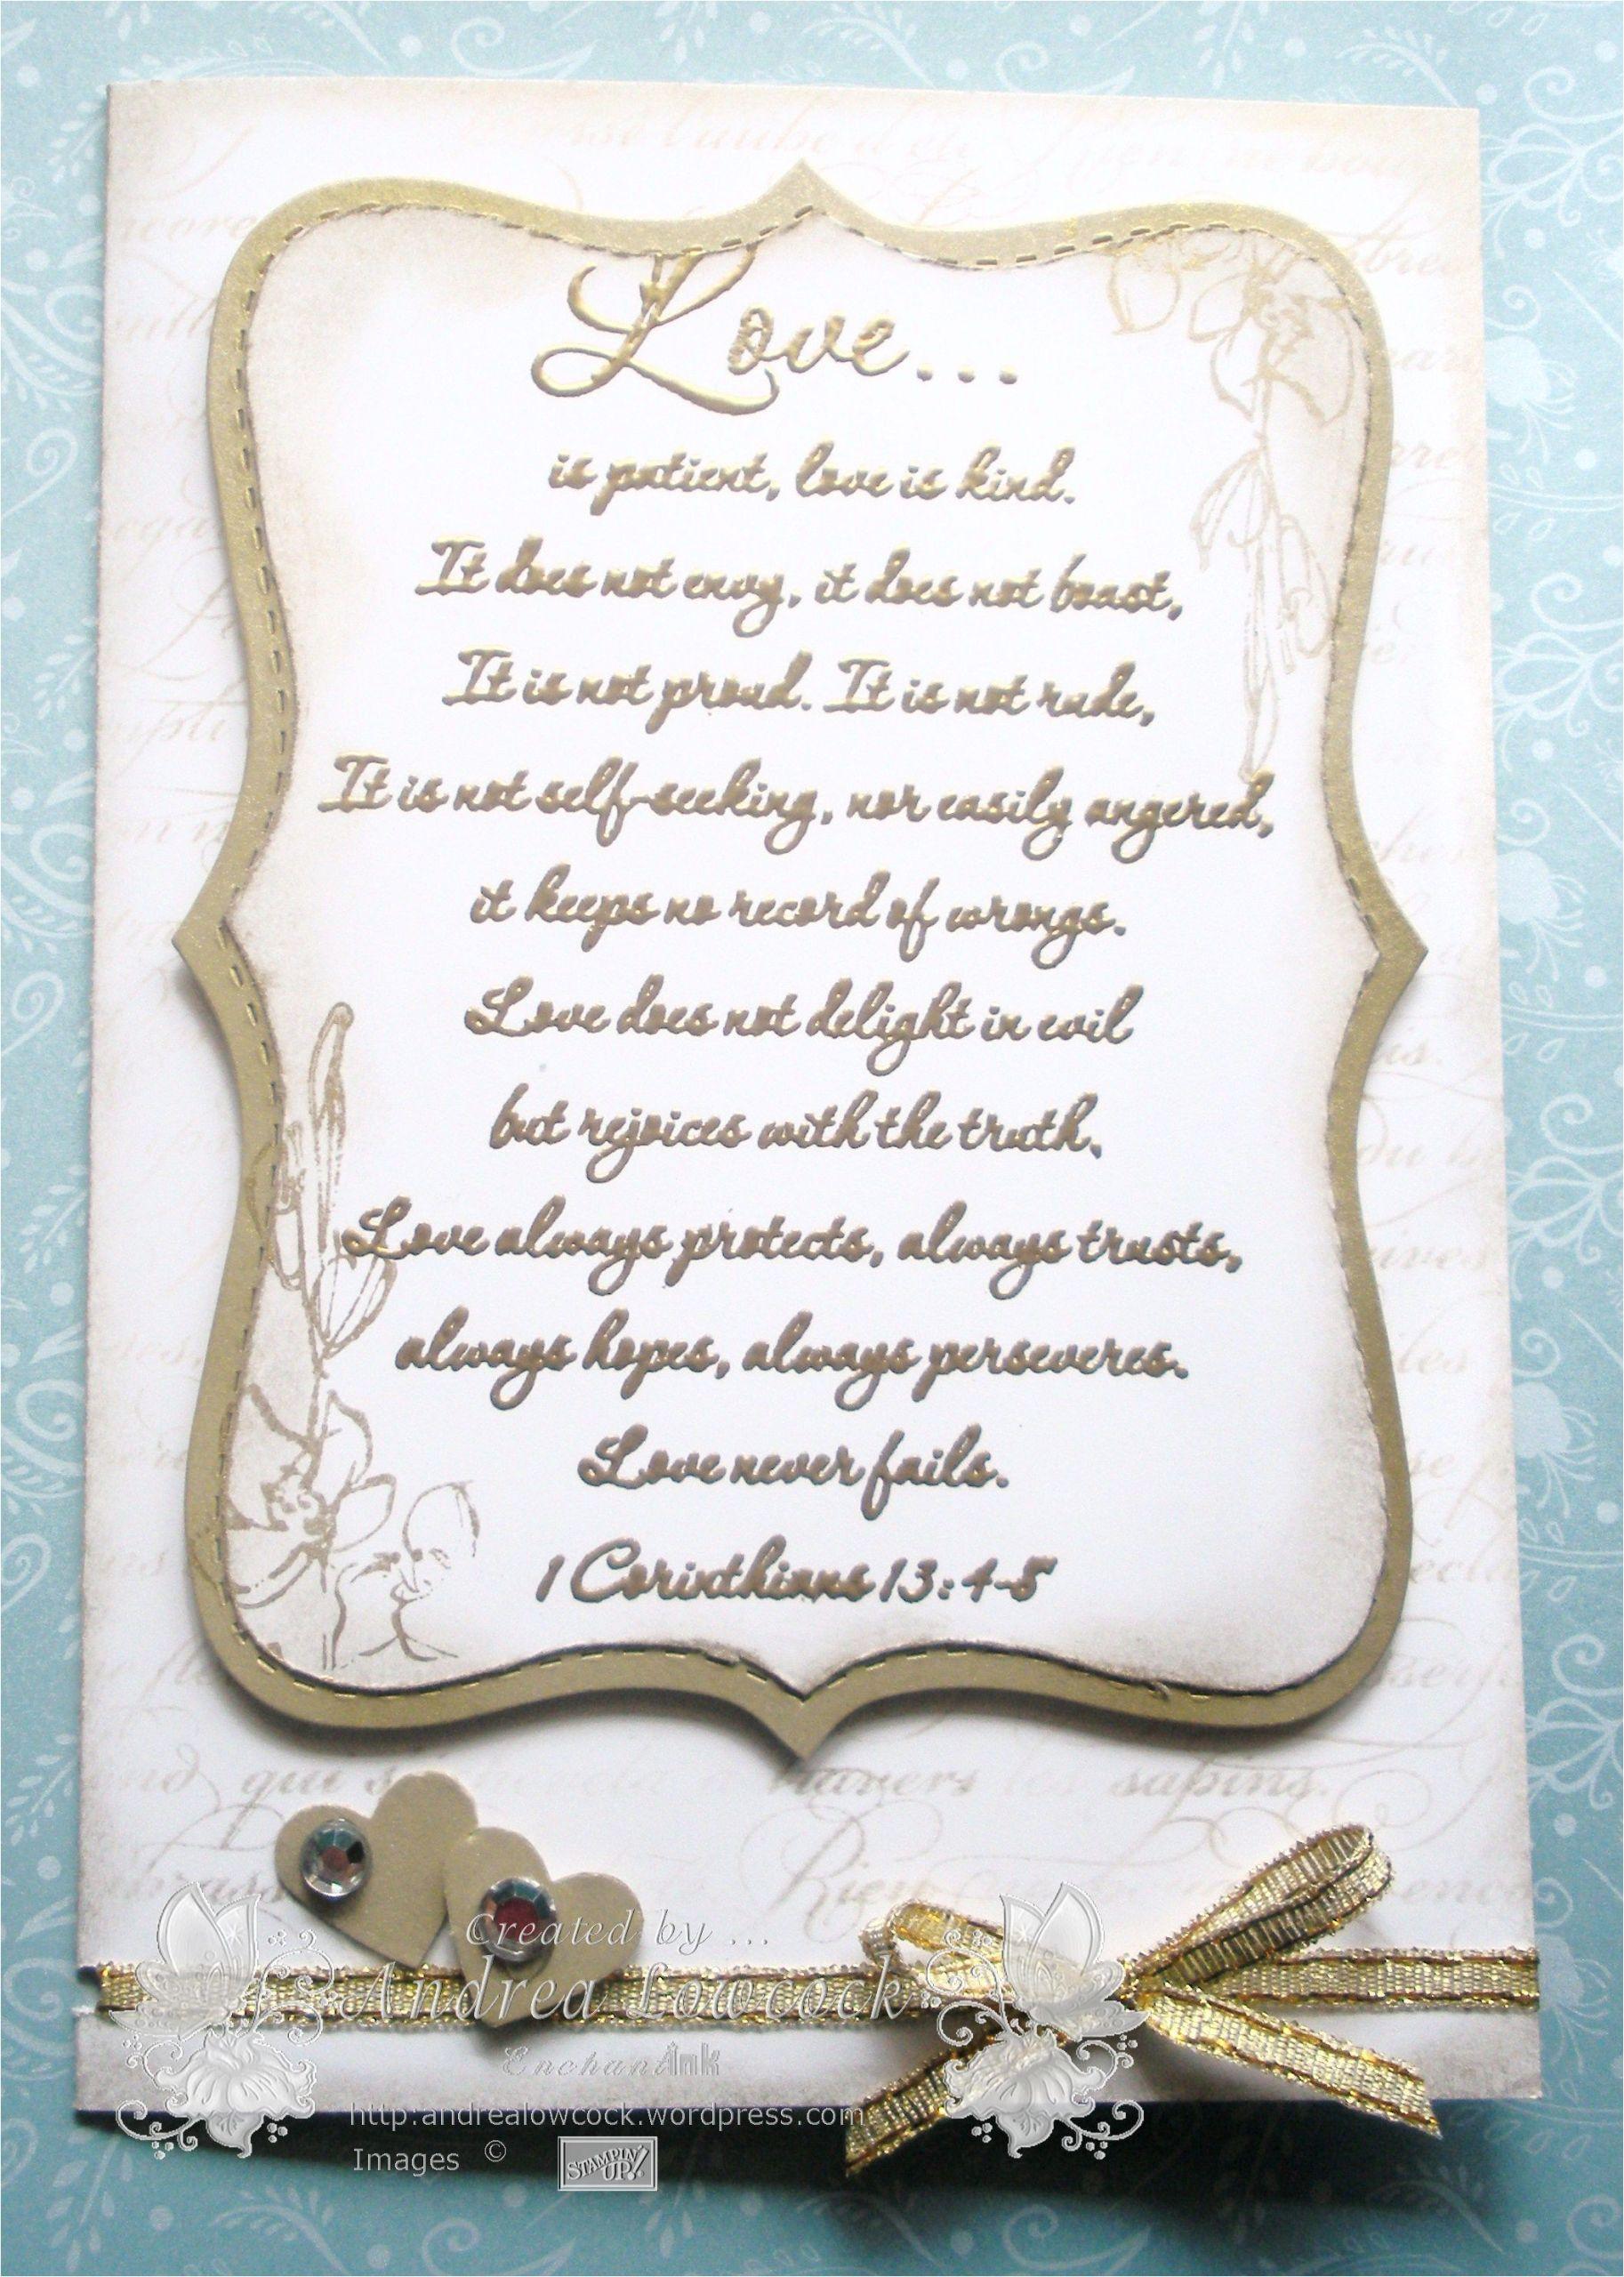 Anniversary Card Verses for Friends 8b37d5a25a15f4ea9d2d087d7fd7a8ff Jpg 2113a 2963 with